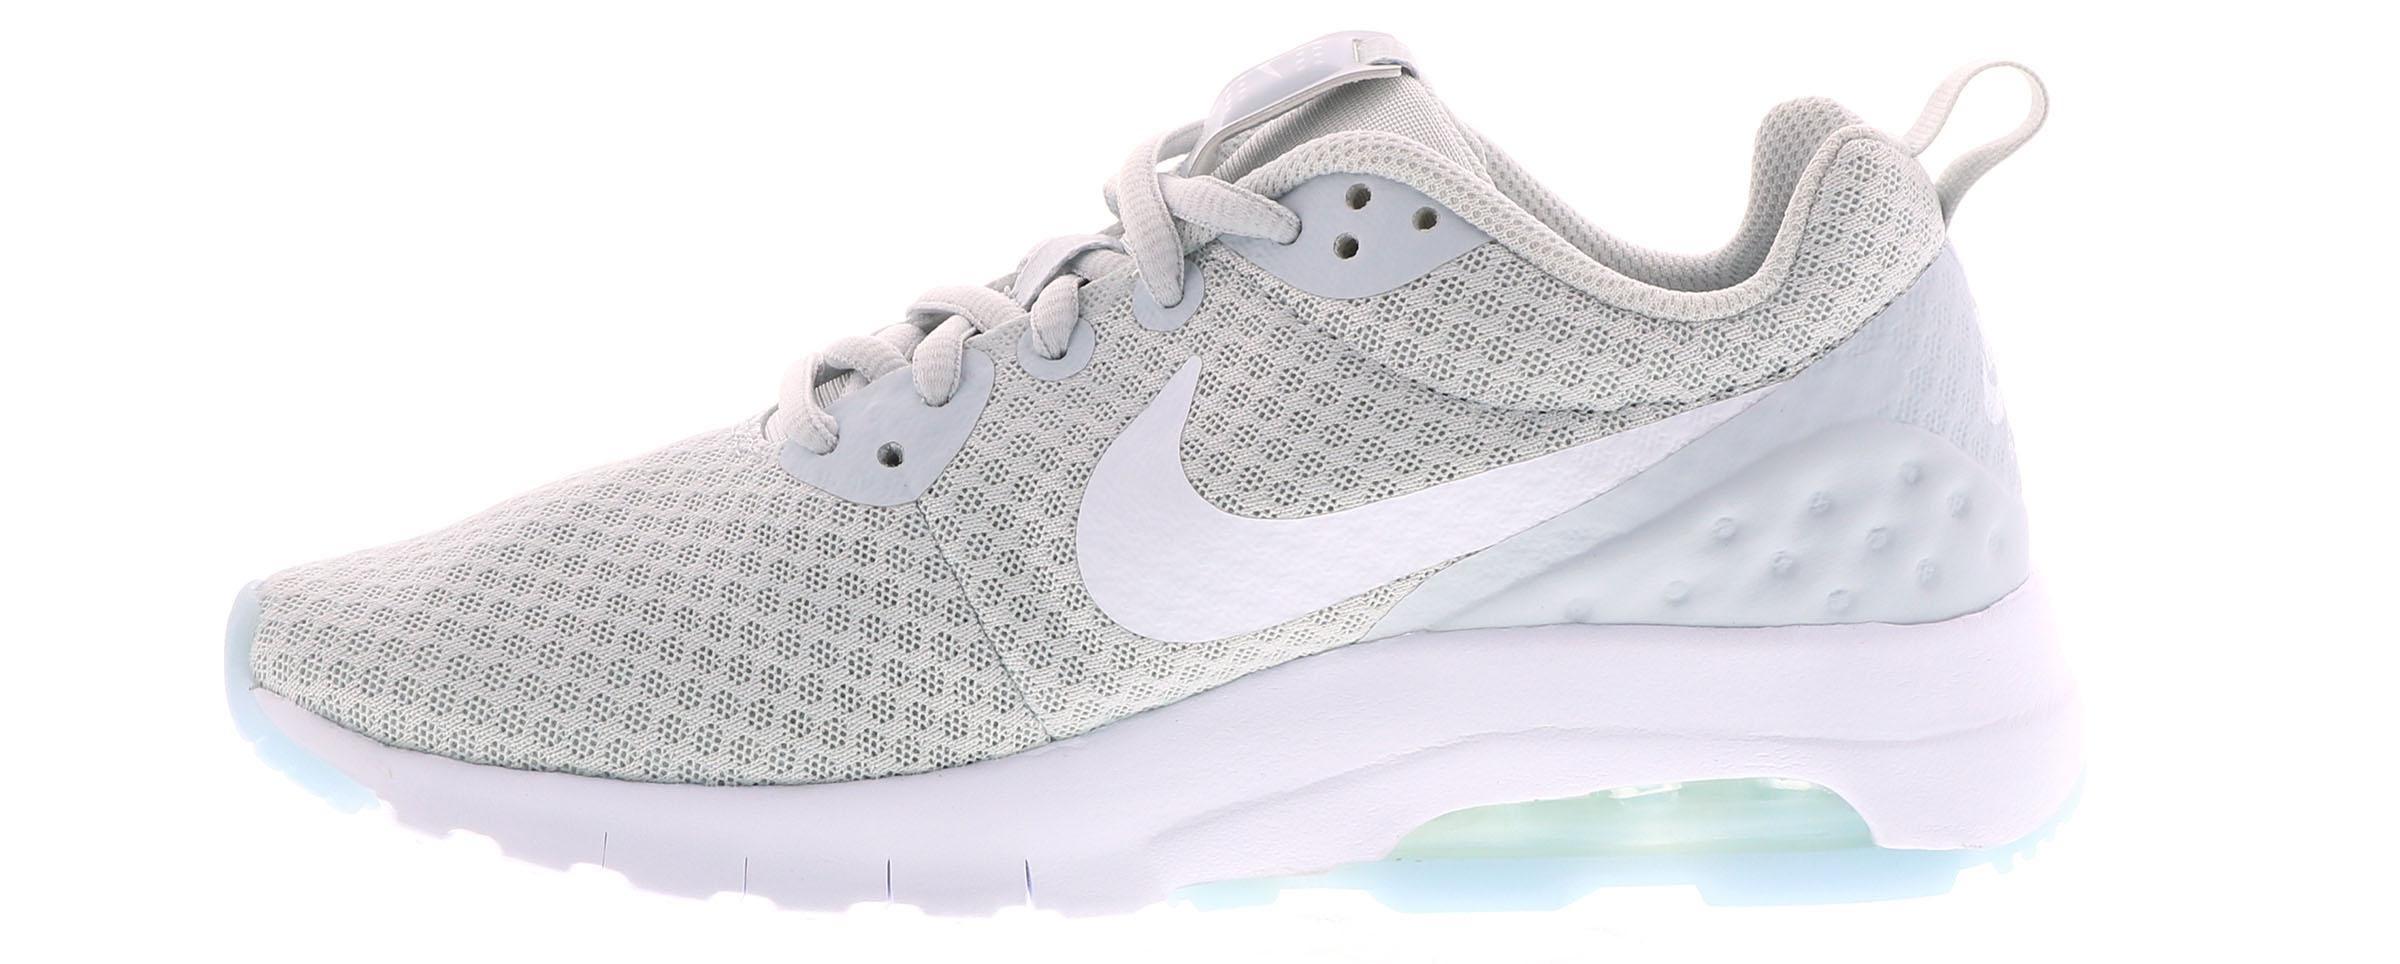 Women's Nike Air Max Motion Grey 833662 010 | Shoe Sensation